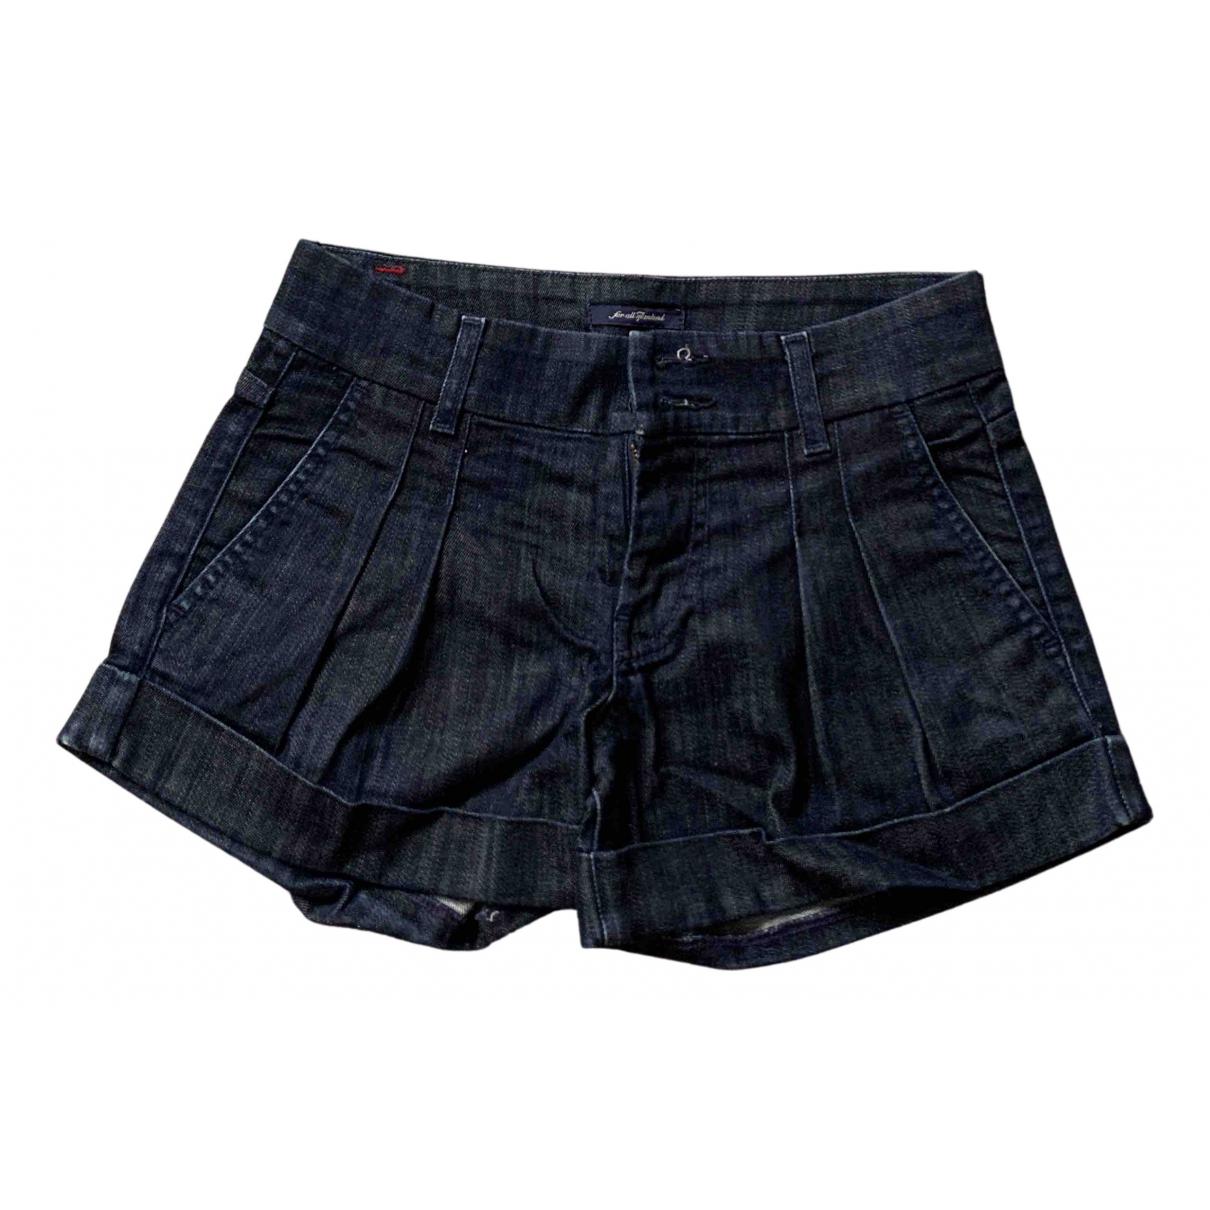 7 For All Mankind \N Shorts in  Blau Denim - Jeans